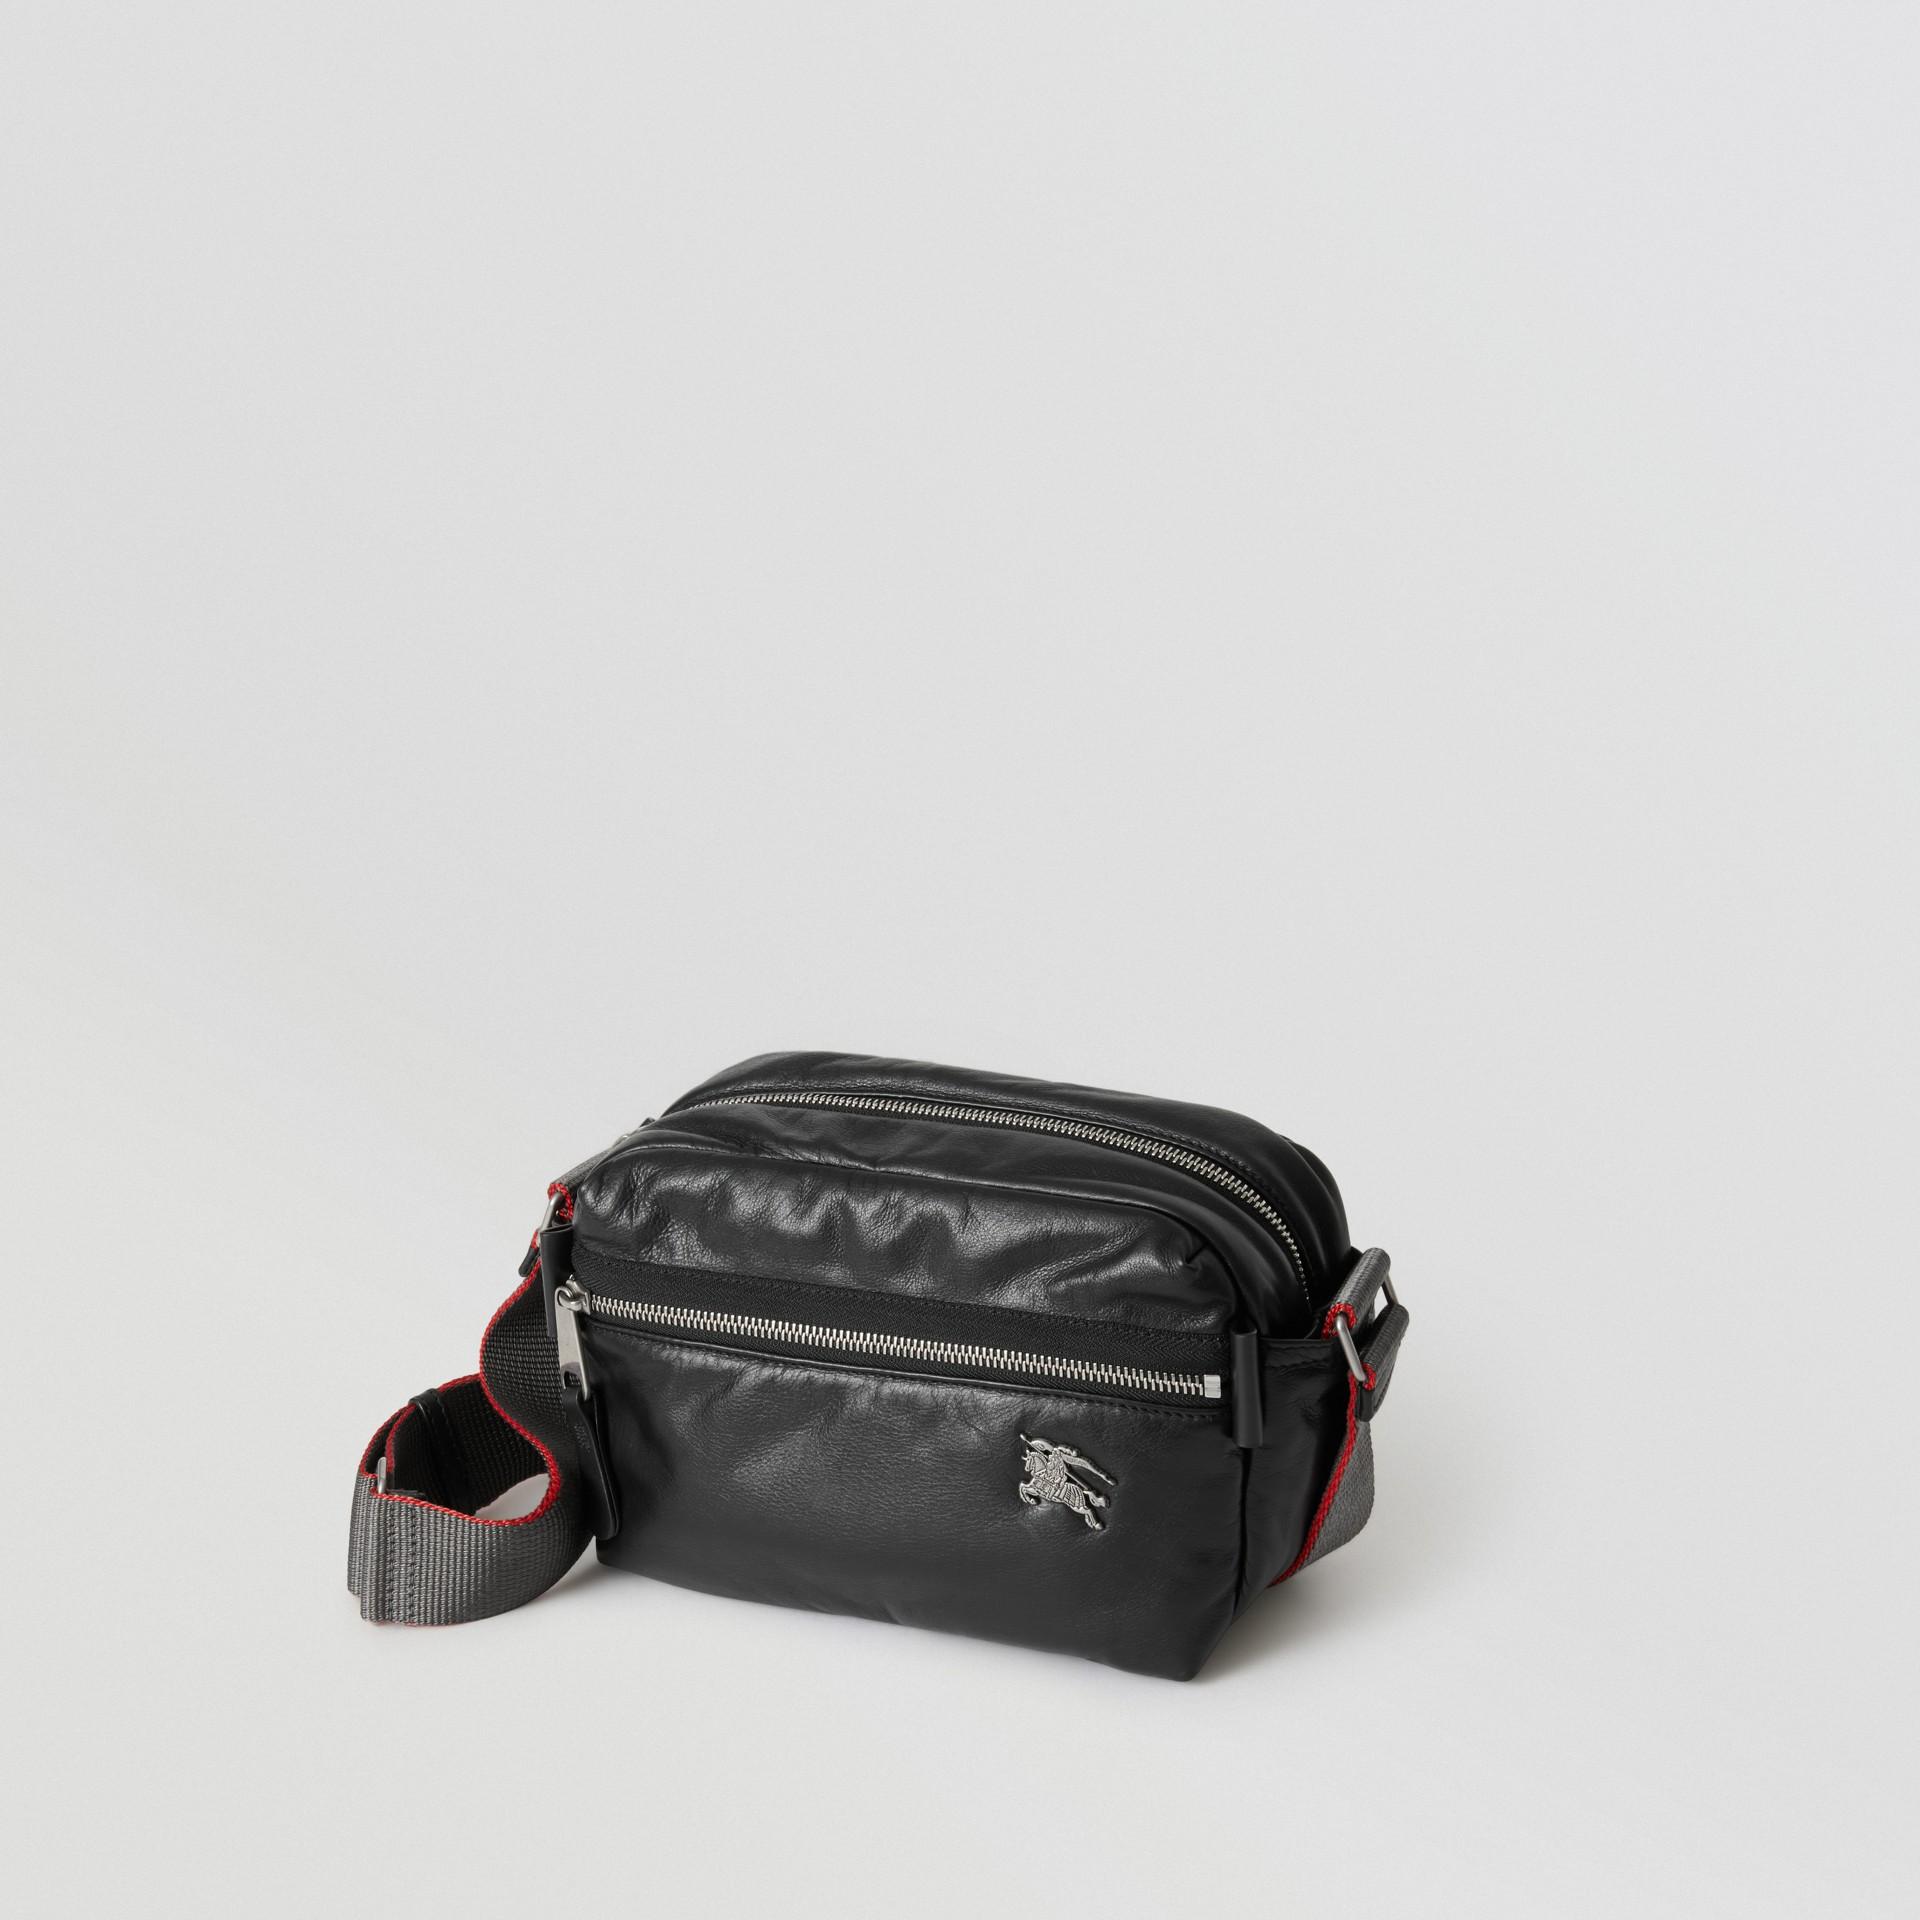 EKD Nappa Leather Crossbody Bag in Black - Men | Burberry United Kingdom - gallery image 2